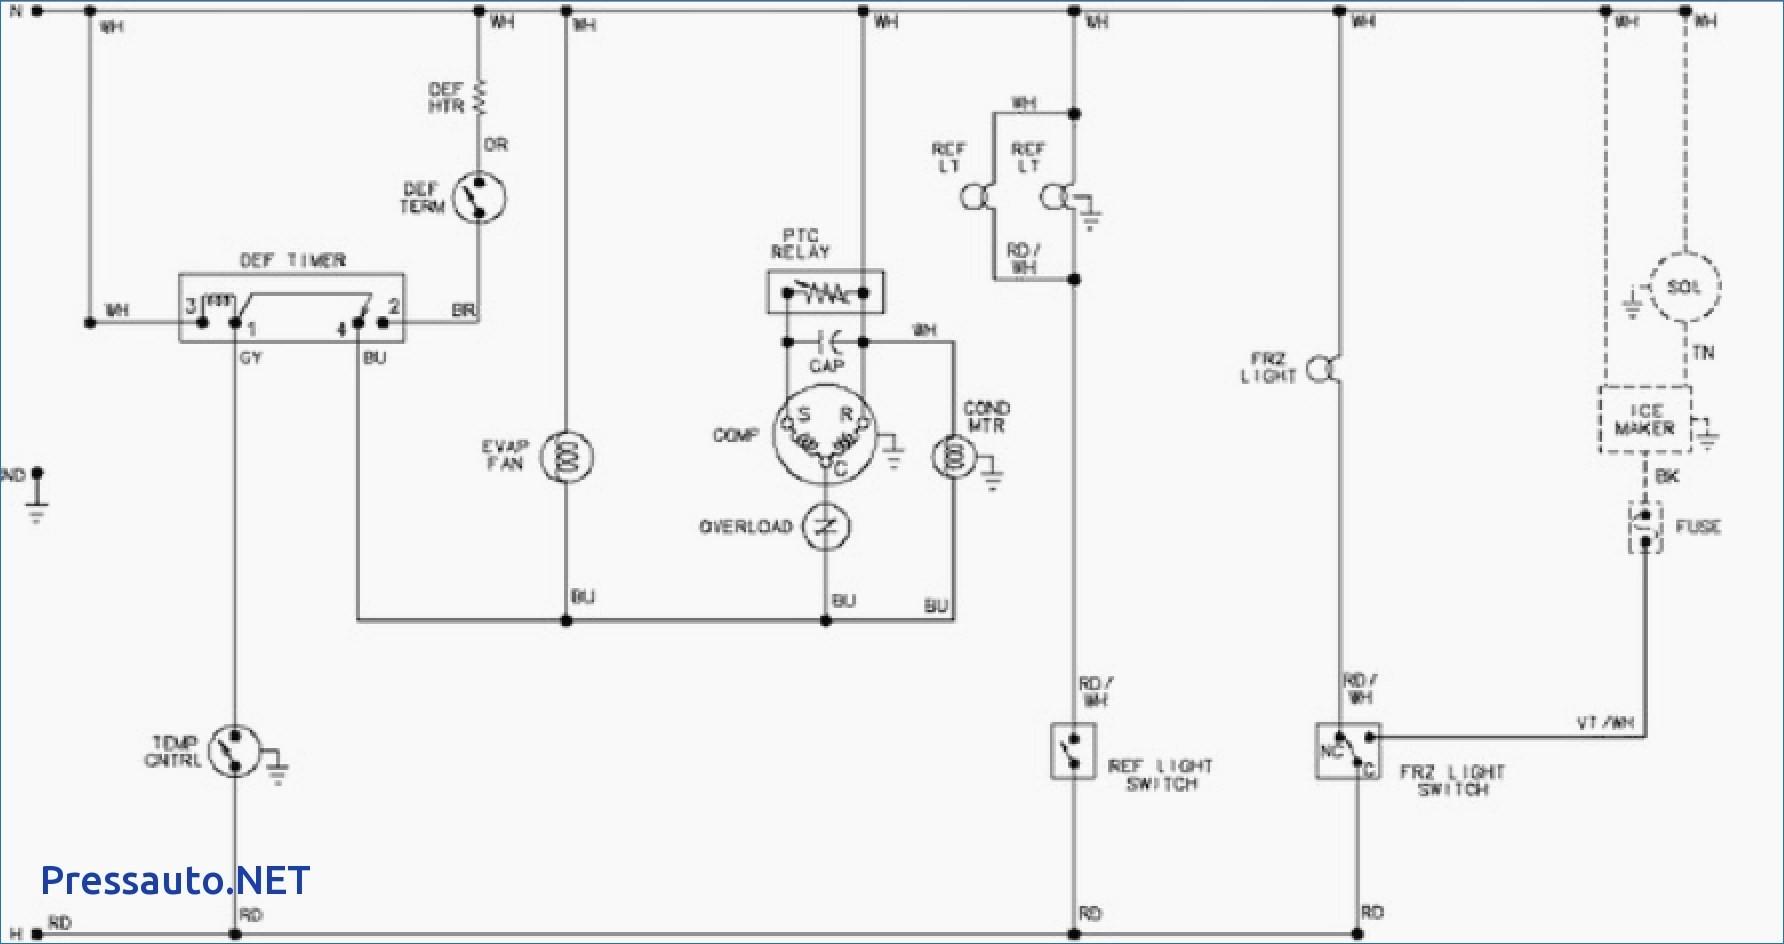 Vdo 1211015461a Speedometer Wiring Diagram Libraries Of Fridge Thermostat Librarygorgeous Refrigerator Pdf Image Amana